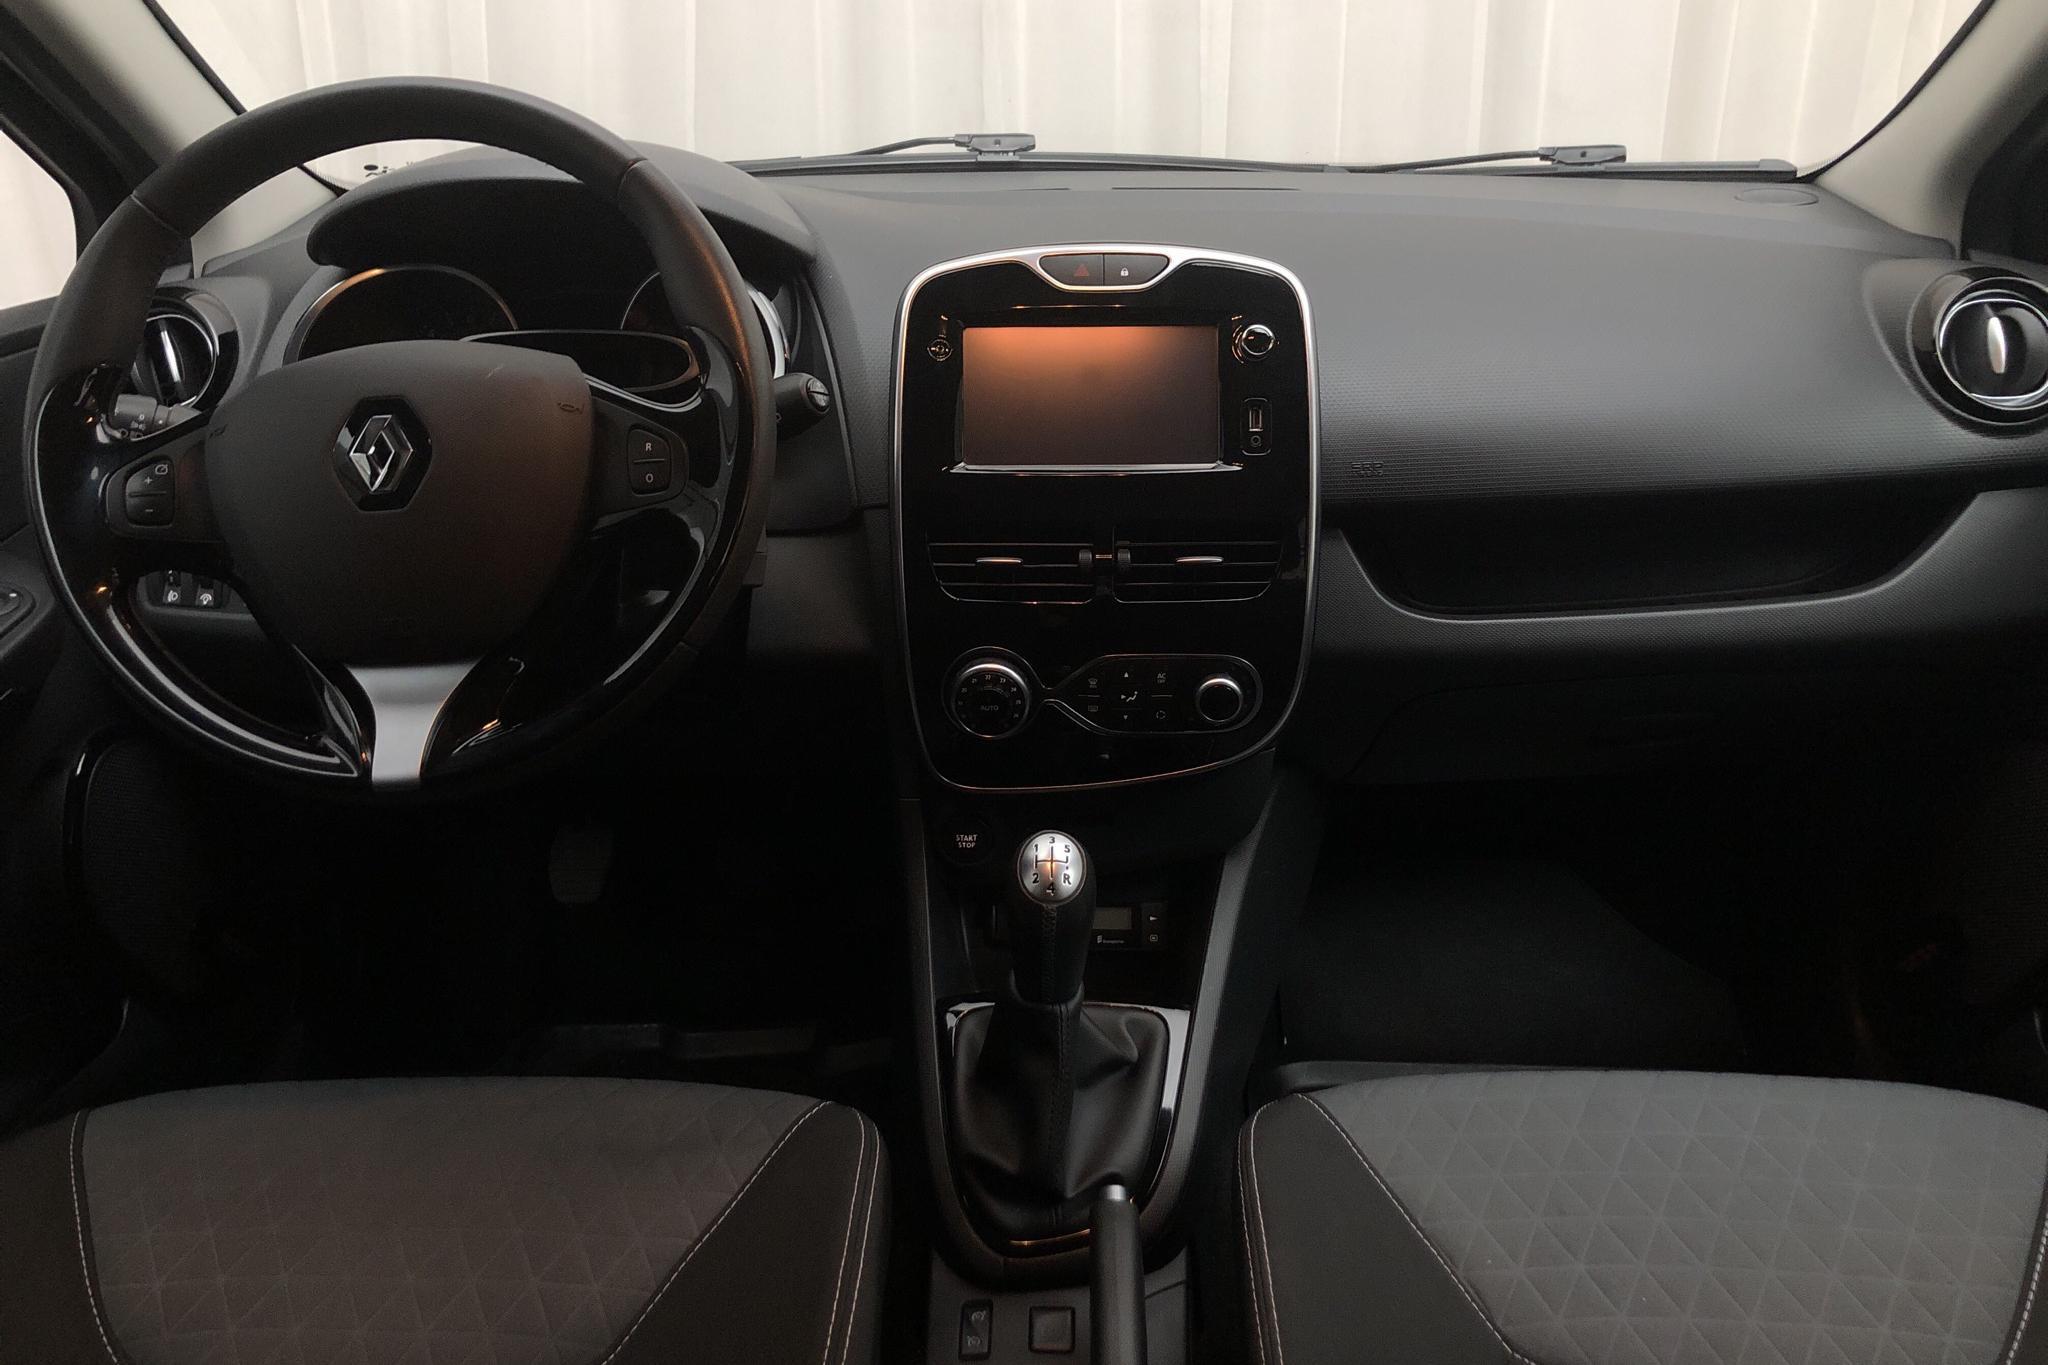 Renault Clio IV 0.9 TCe 90 5dr (90hk) - 4 420 mil - Manuell - svart - 2015